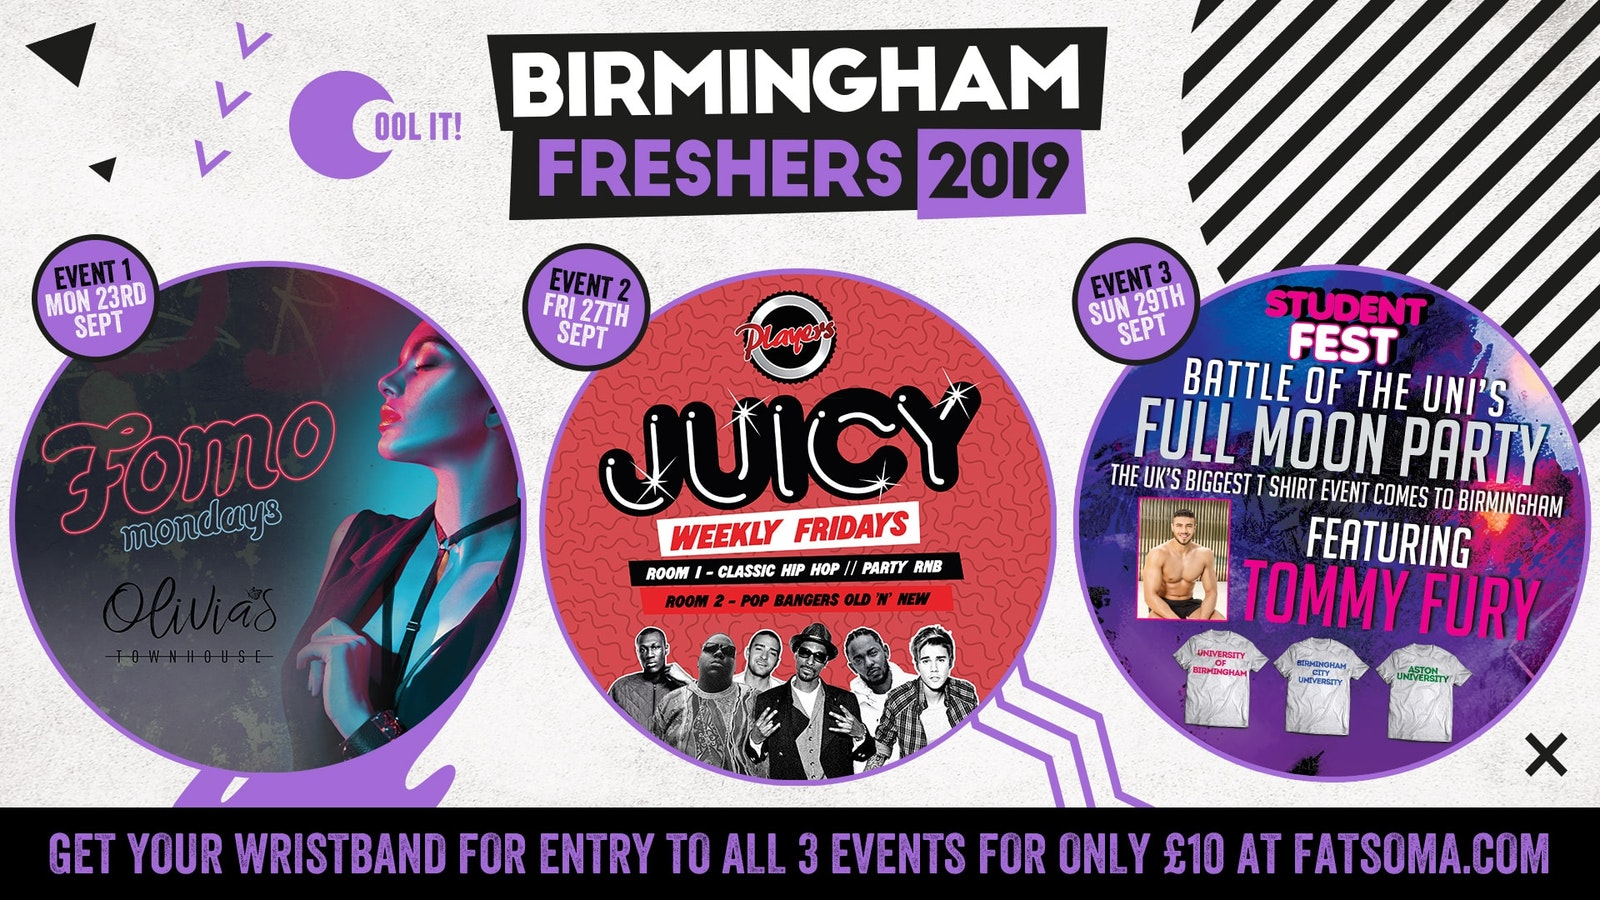 Birmingham Freshers 2019 Wristband incl. BAR CRAWL WITH TOMMY FURY